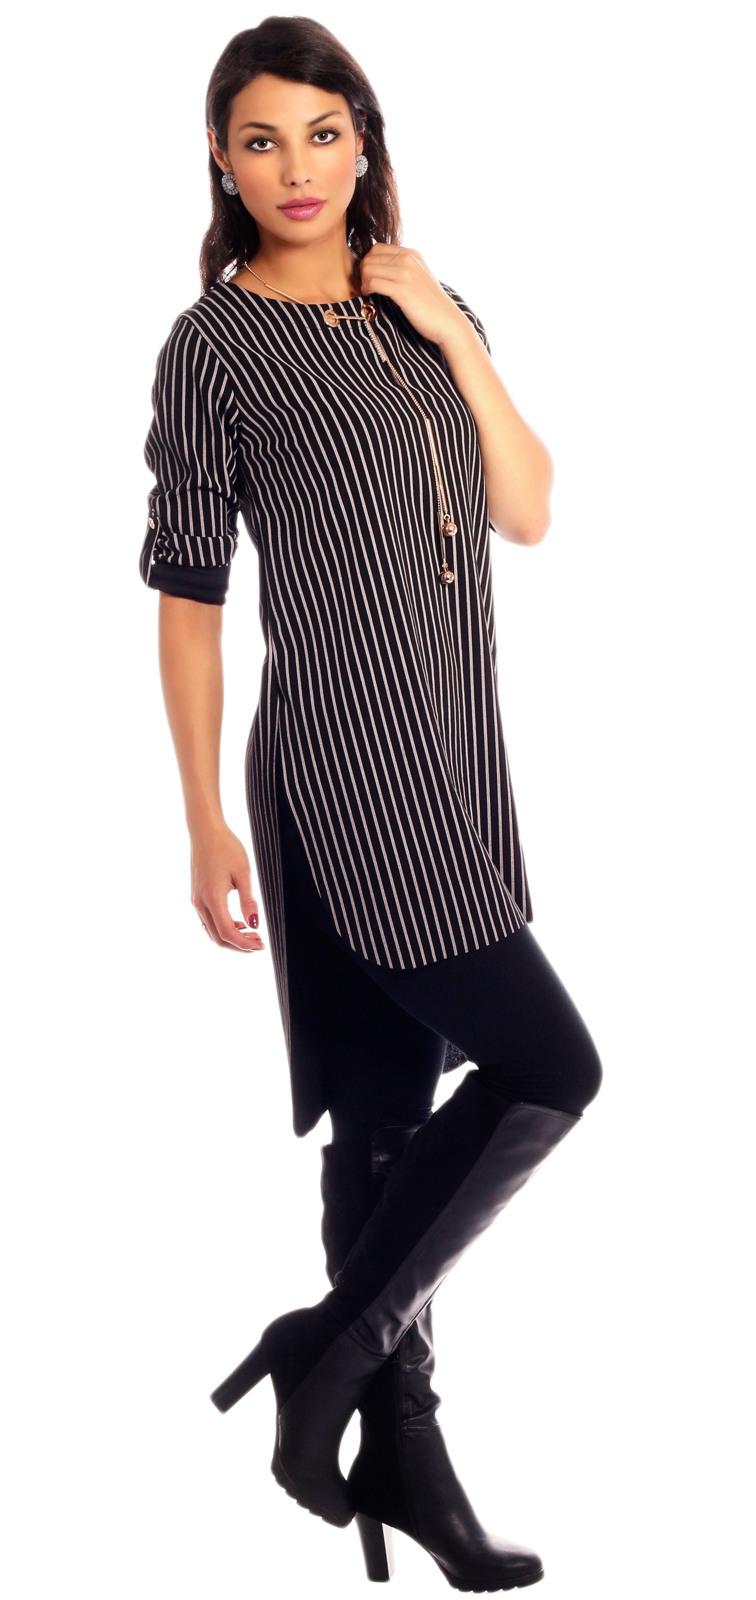 Tunika Kleid Mit Modeschmuckkette Im Colour Stripes Look